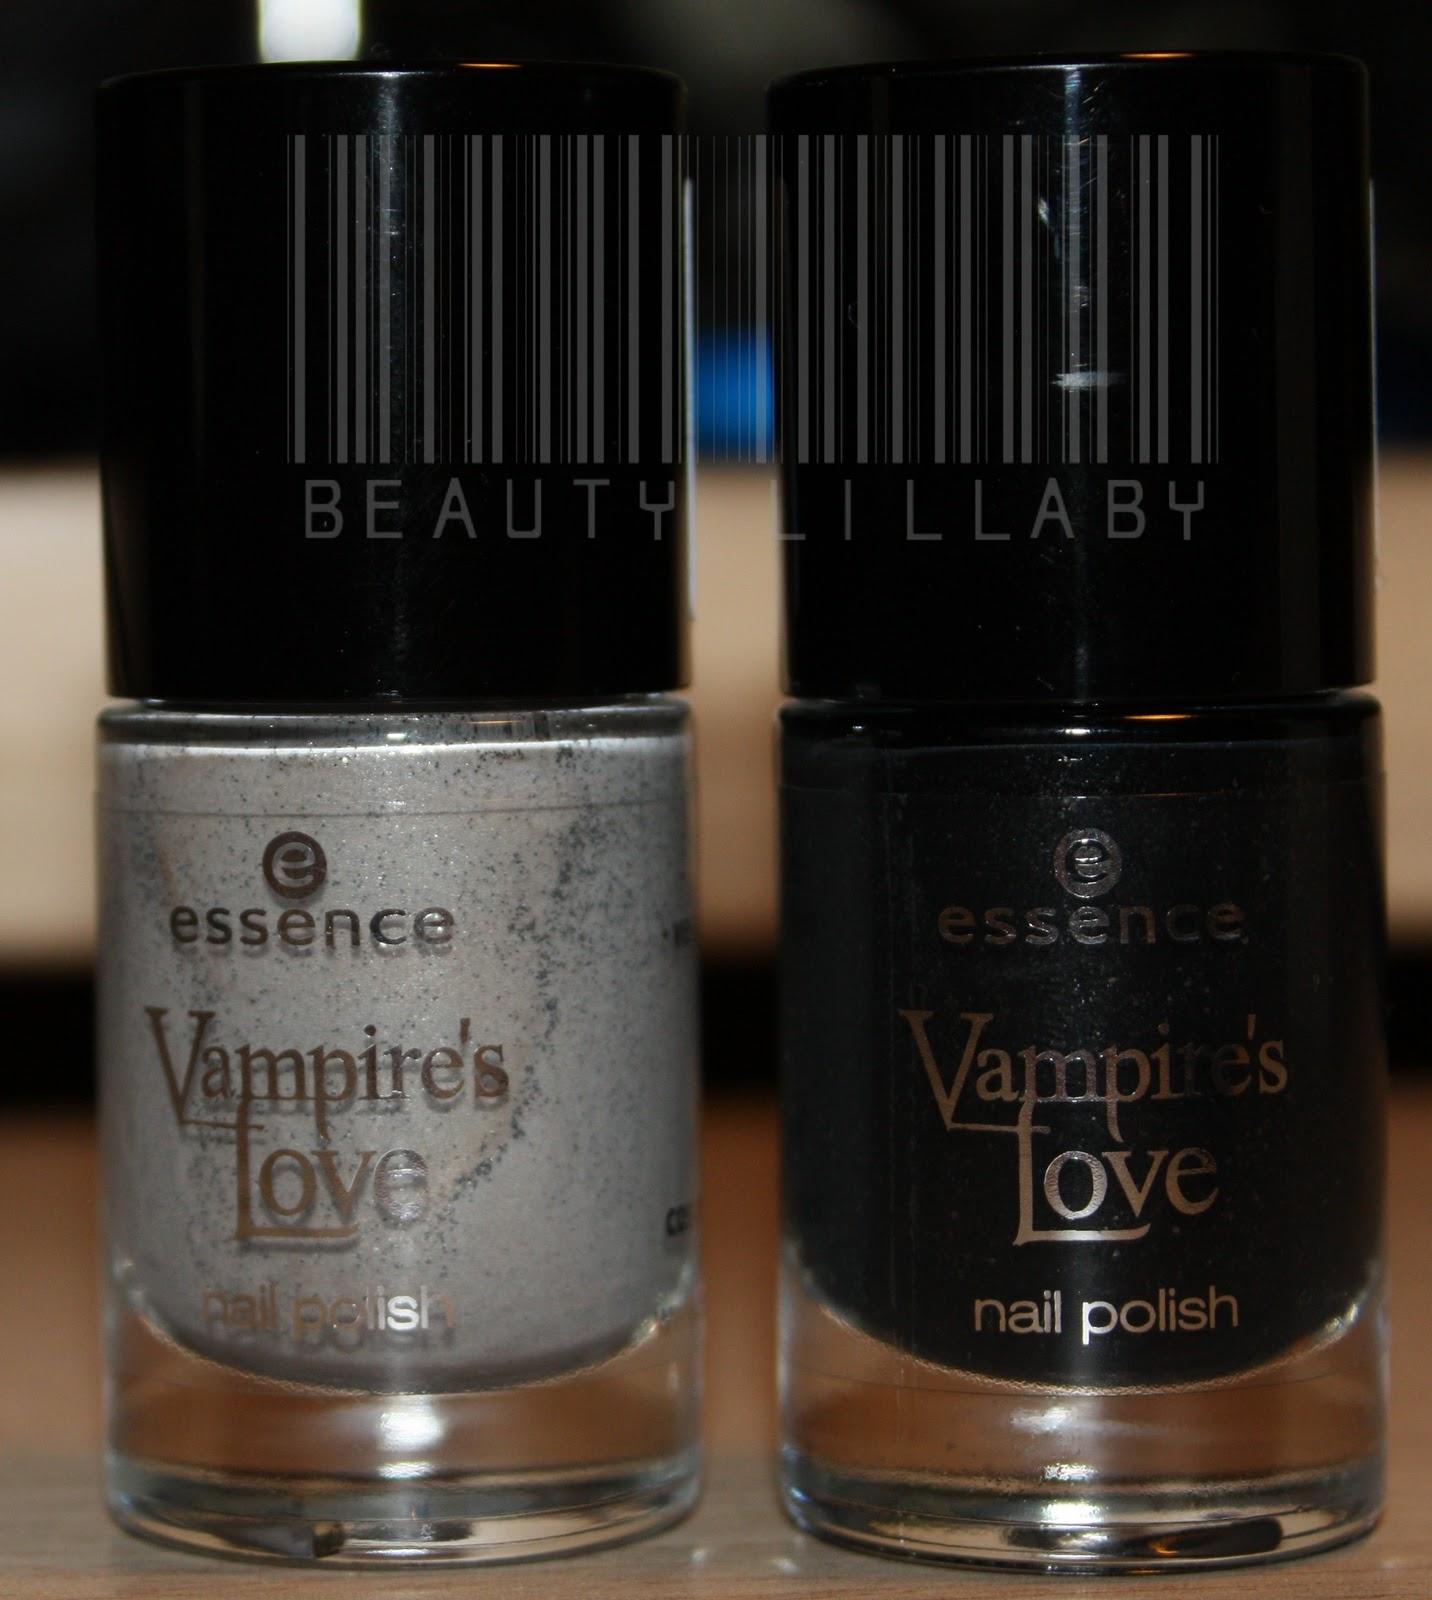 Vampire Nail Polish: Blillaby's: Essence Vampire's Love Nail Polishes 04 & 05